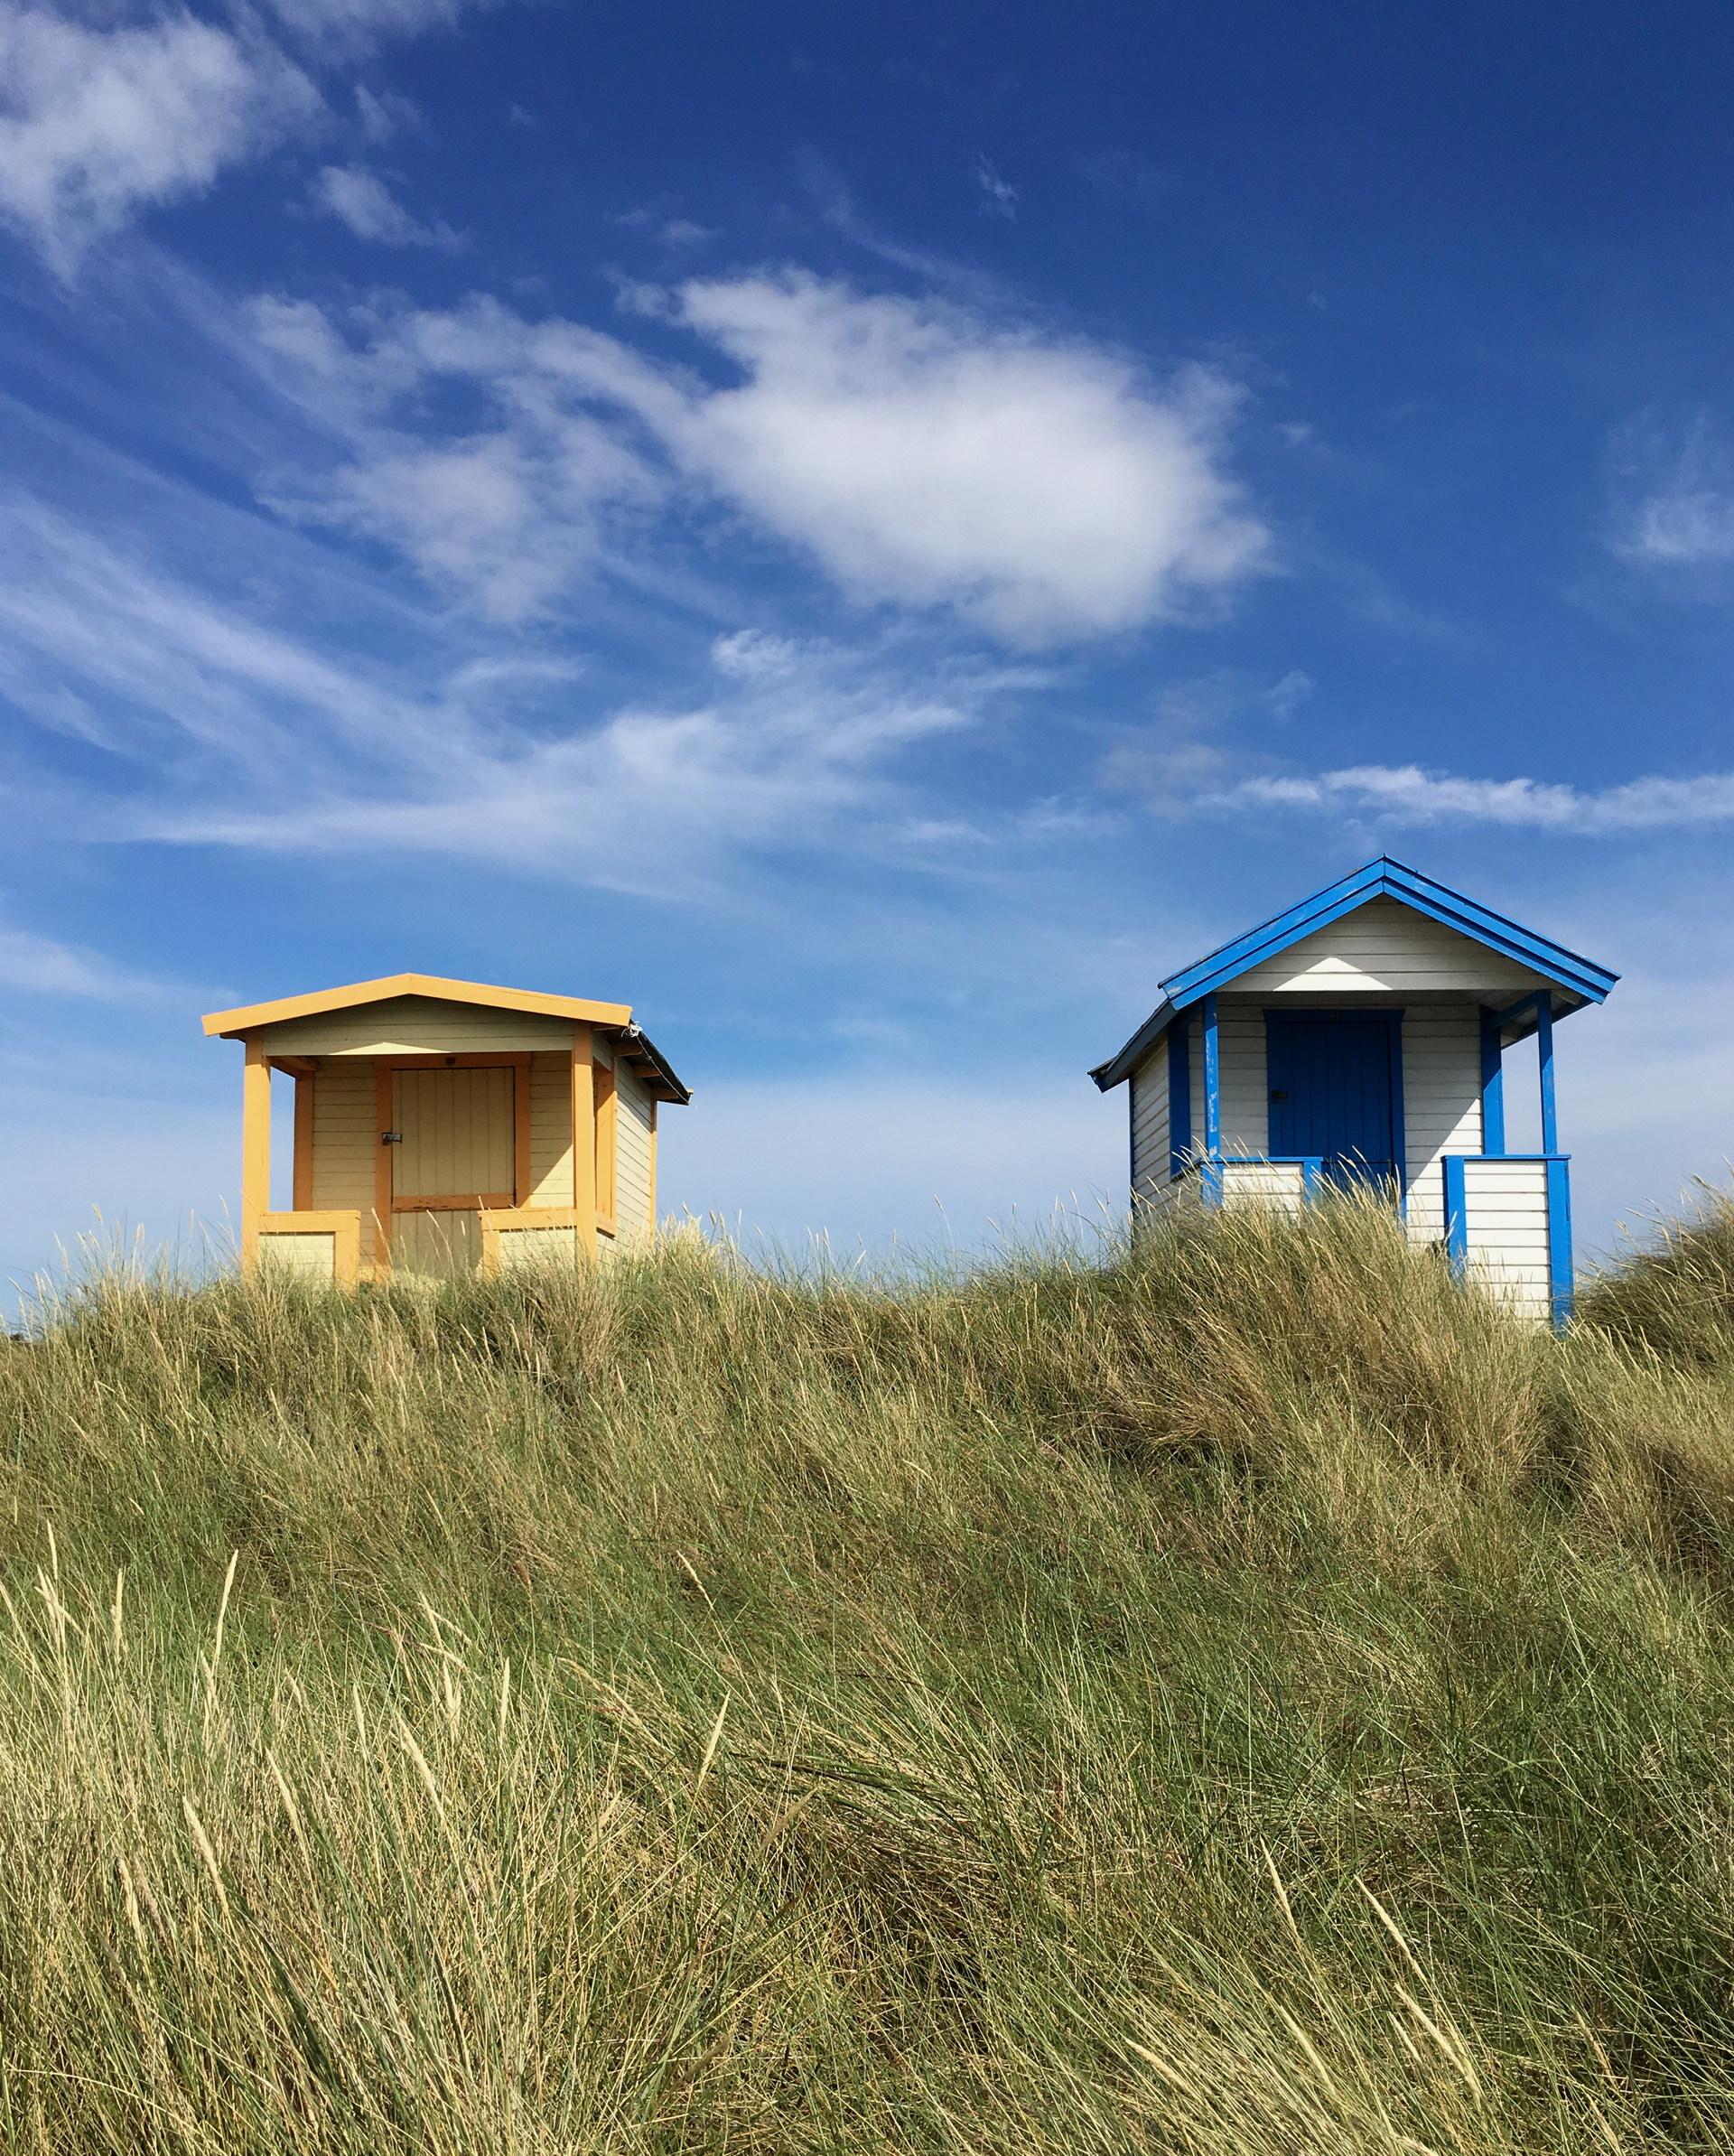 Beach huts in Skanör. | piapising, architecture, blue sky, countryside